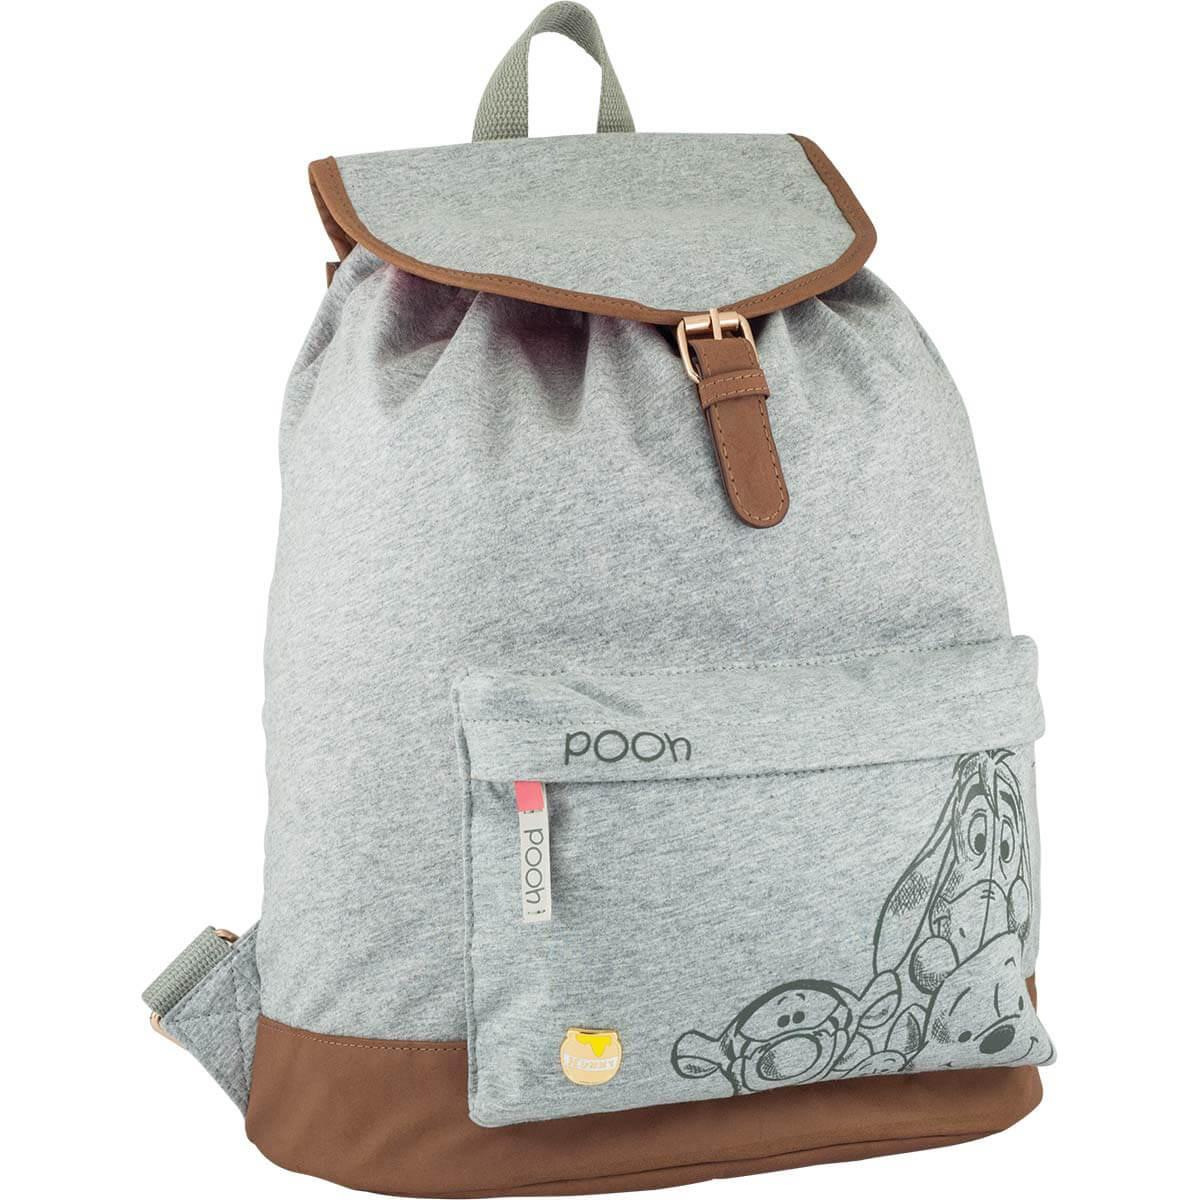 Mochila Escolar Pooh 146023 - Tilibra